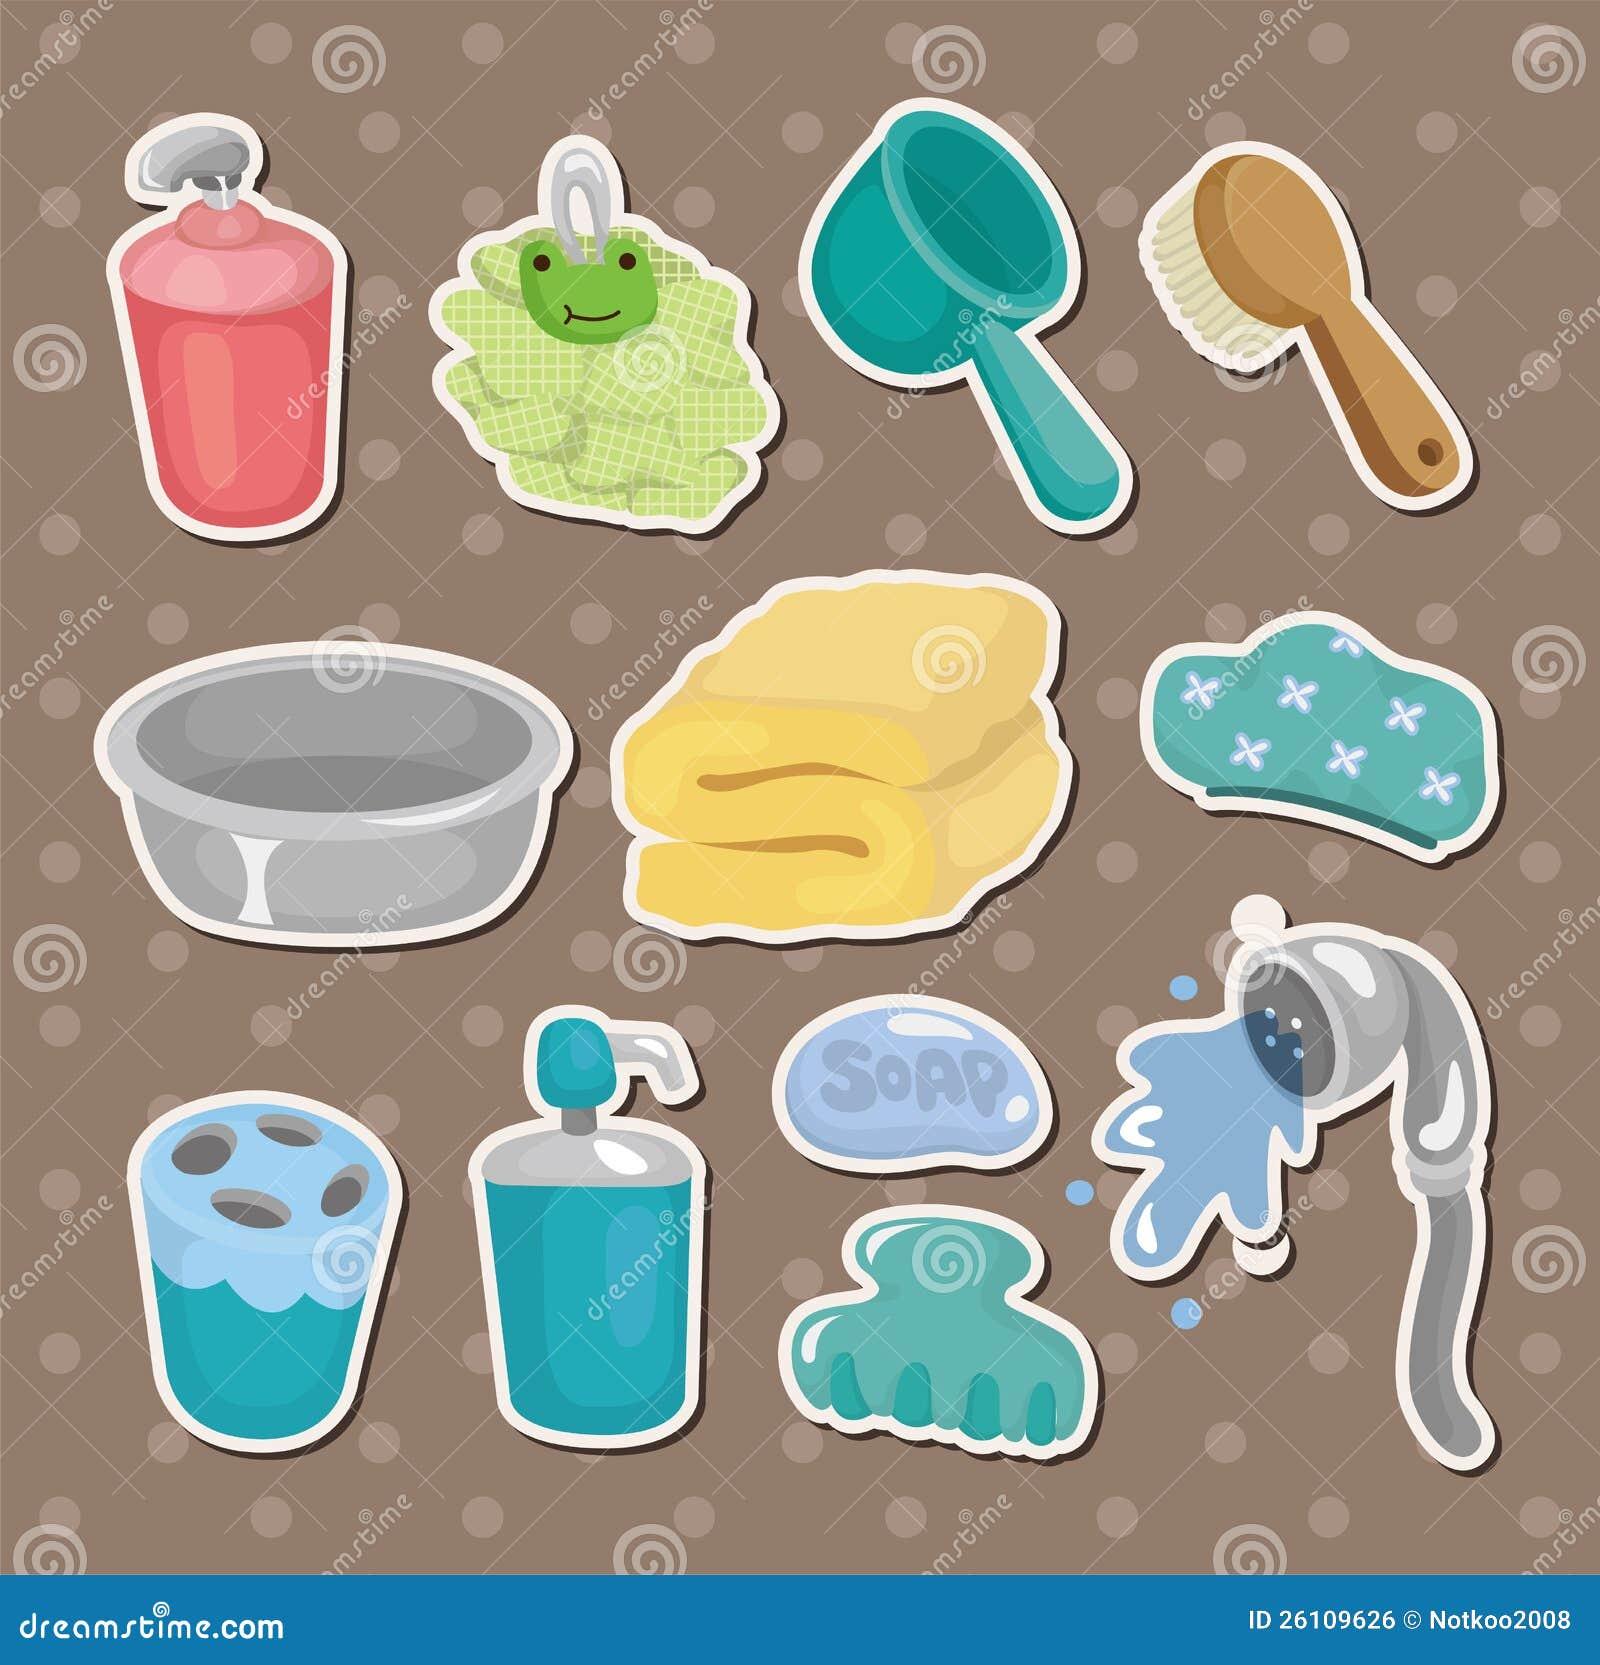 wonderful dessiner ma salle de bain #4: alice et la salle de bain ... - Dessiner Ma Salle De Bain